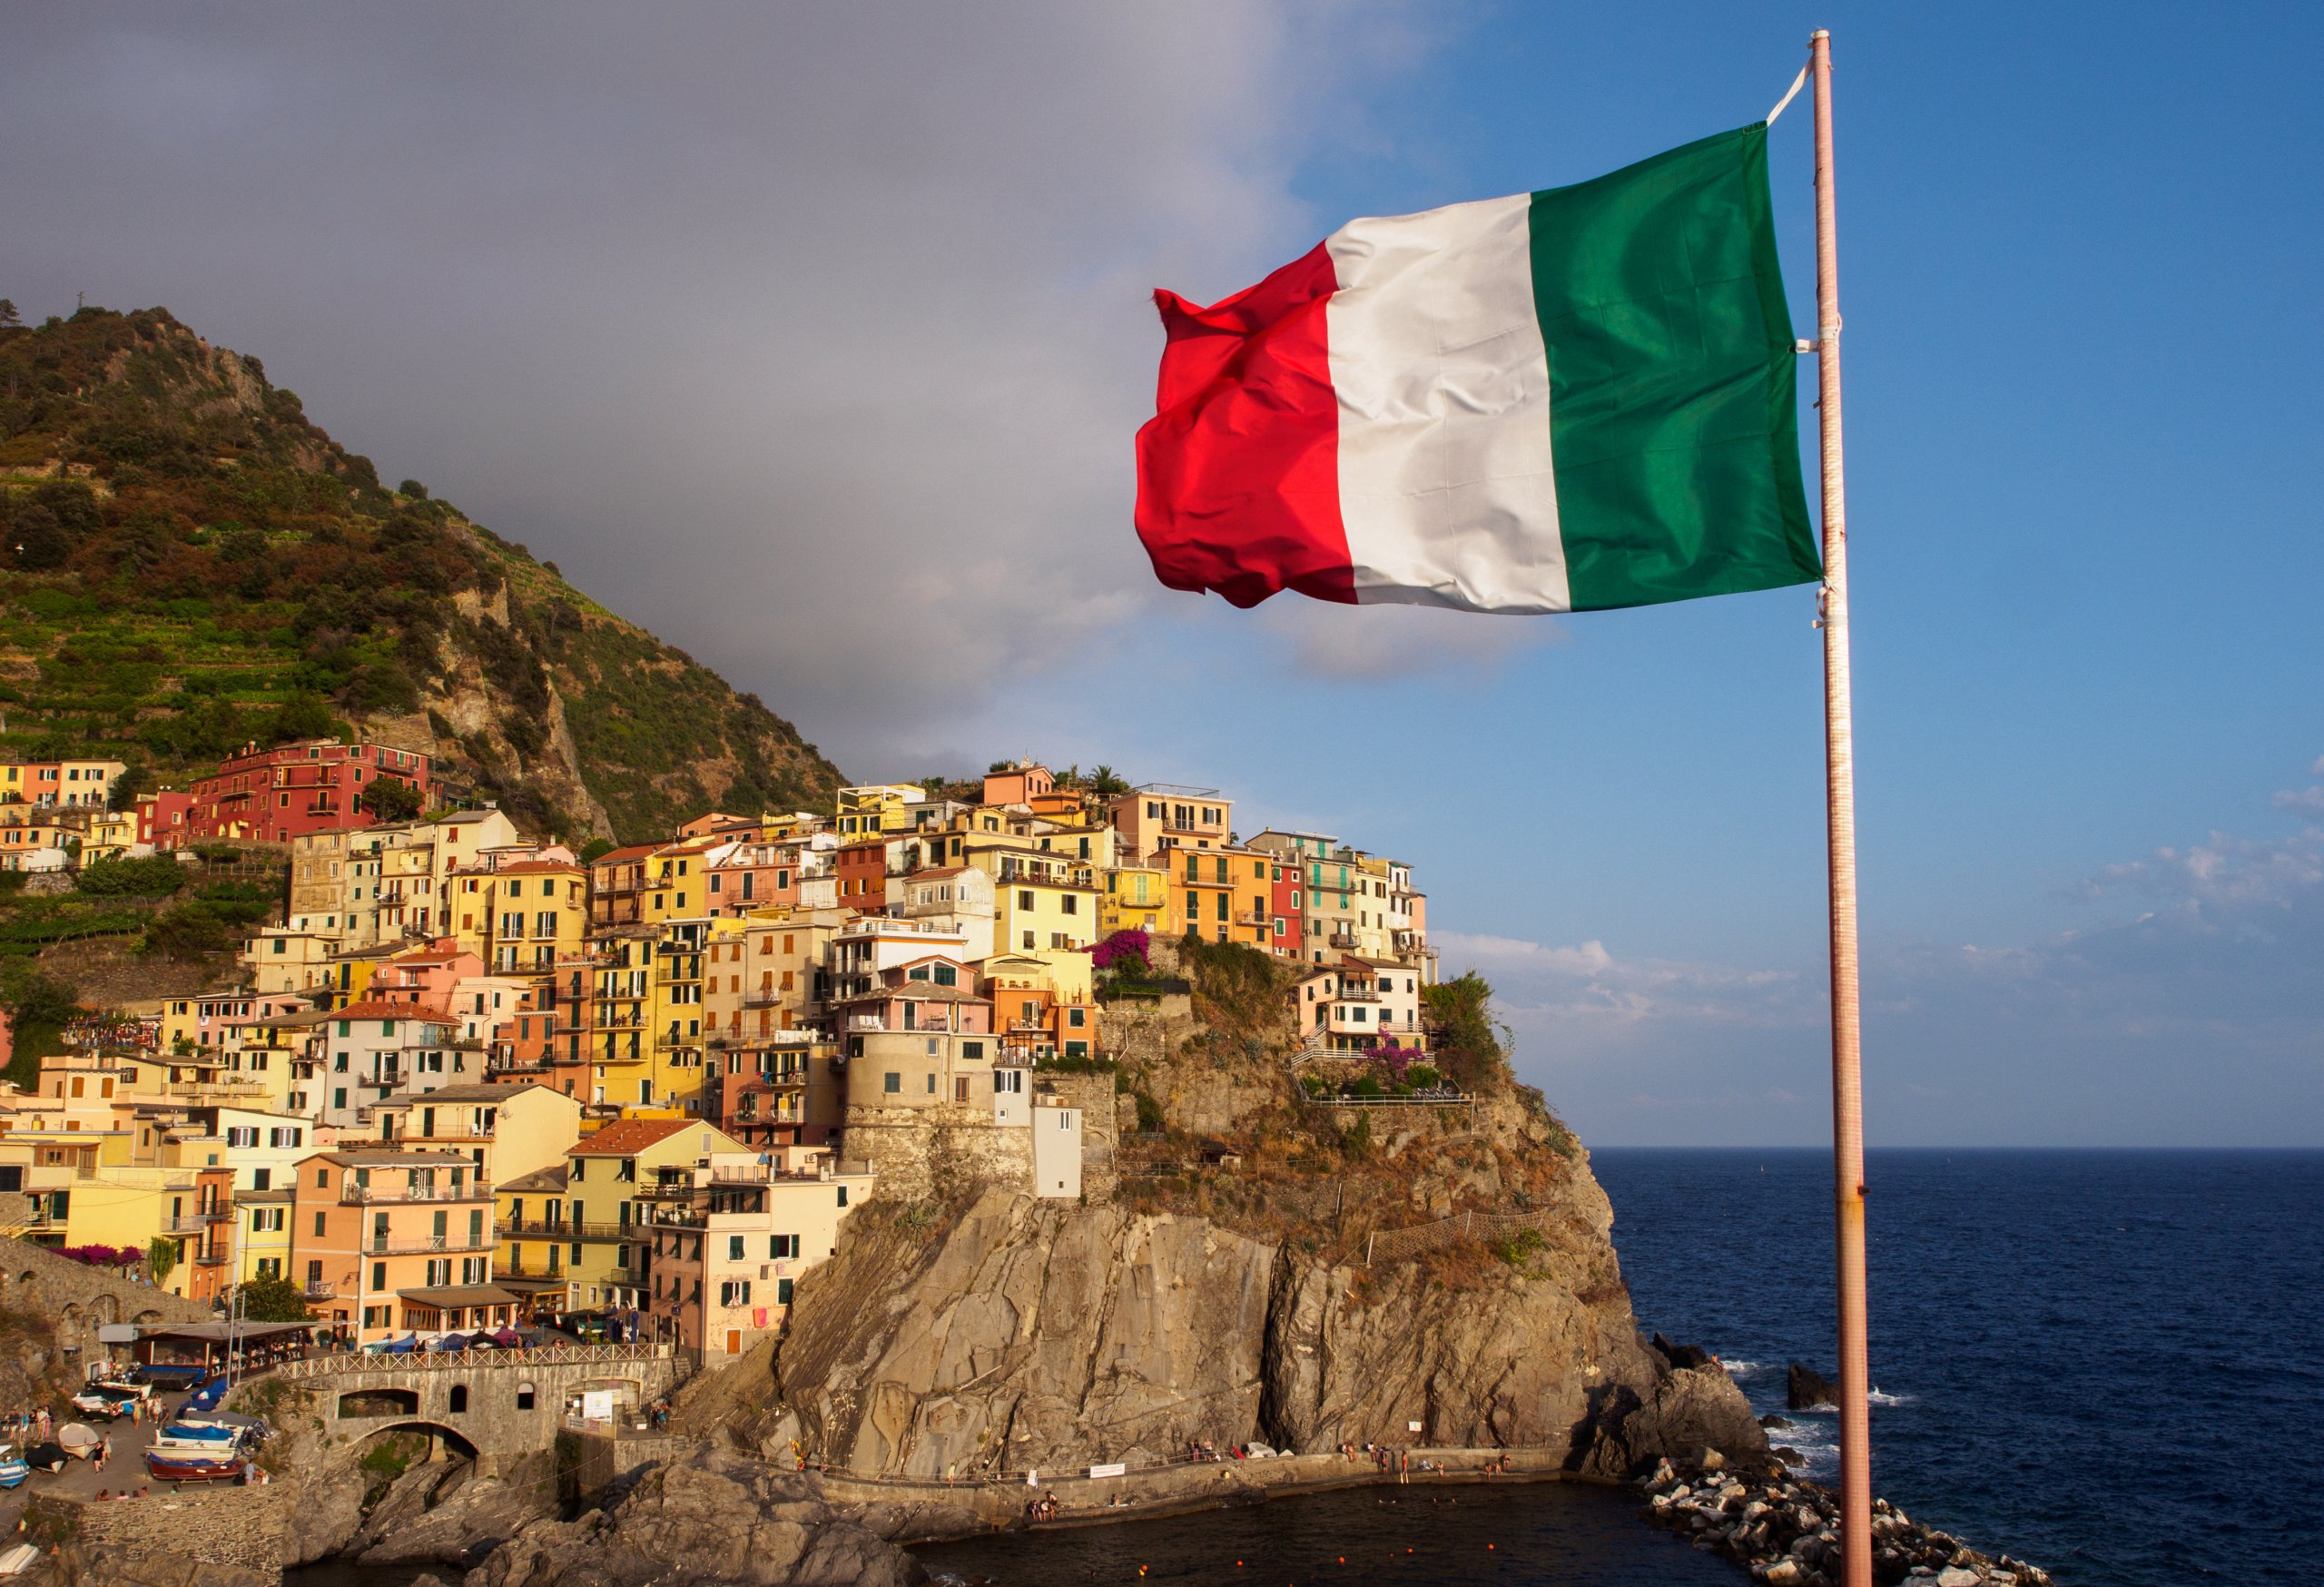 Manarola village in Cinque Terre with italian flag in foreground